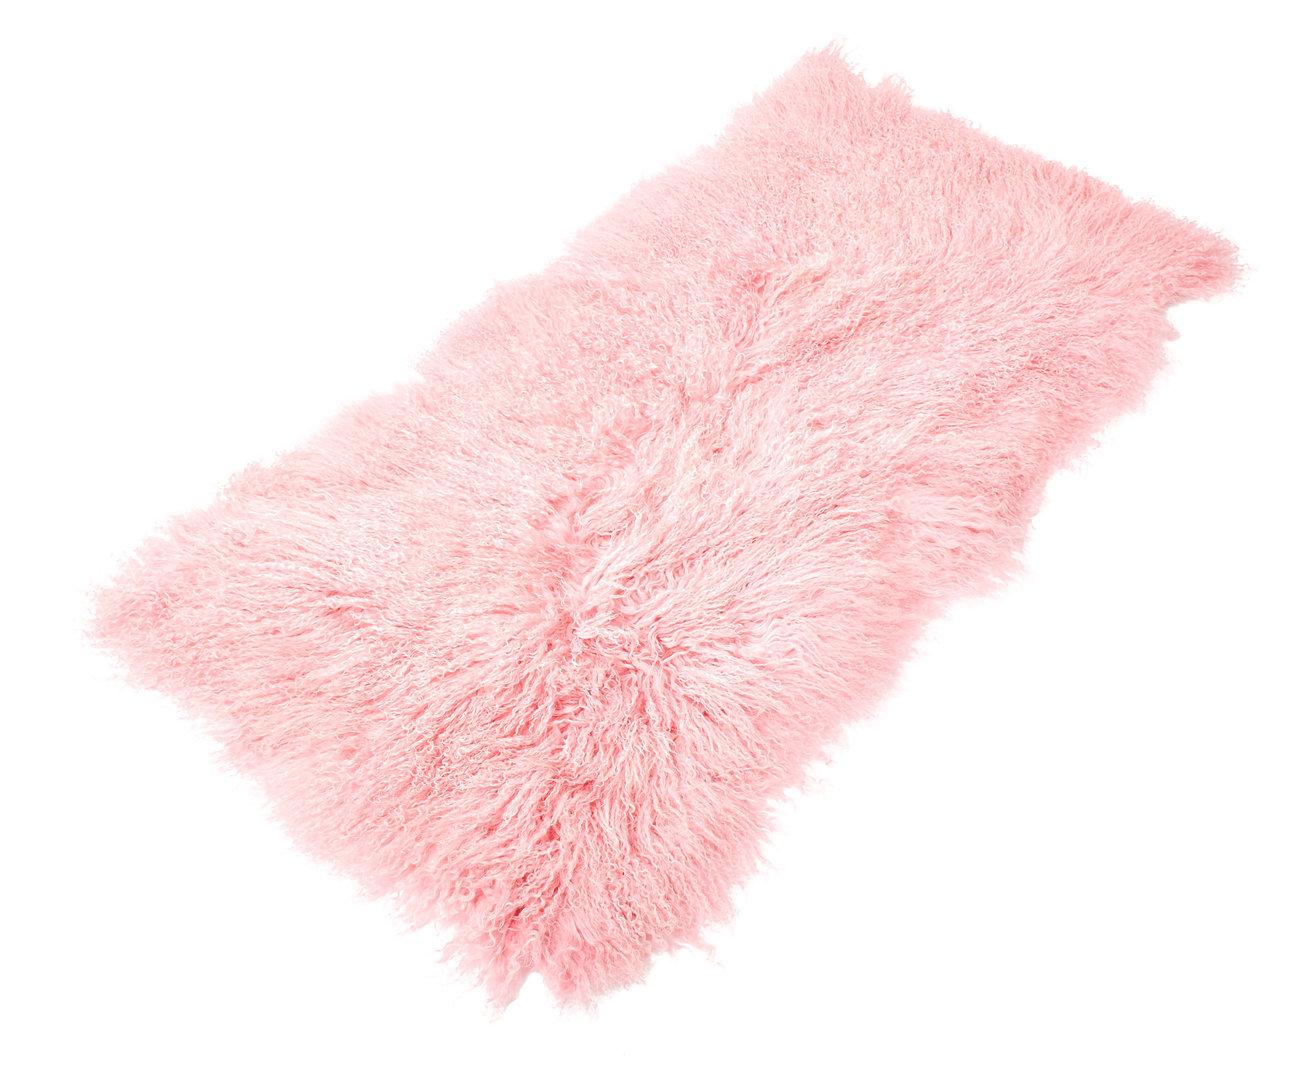 tibet lammfell teppich rechteckig ros rosa. Black Bedroom Furniture Sets. Home Design Ideas